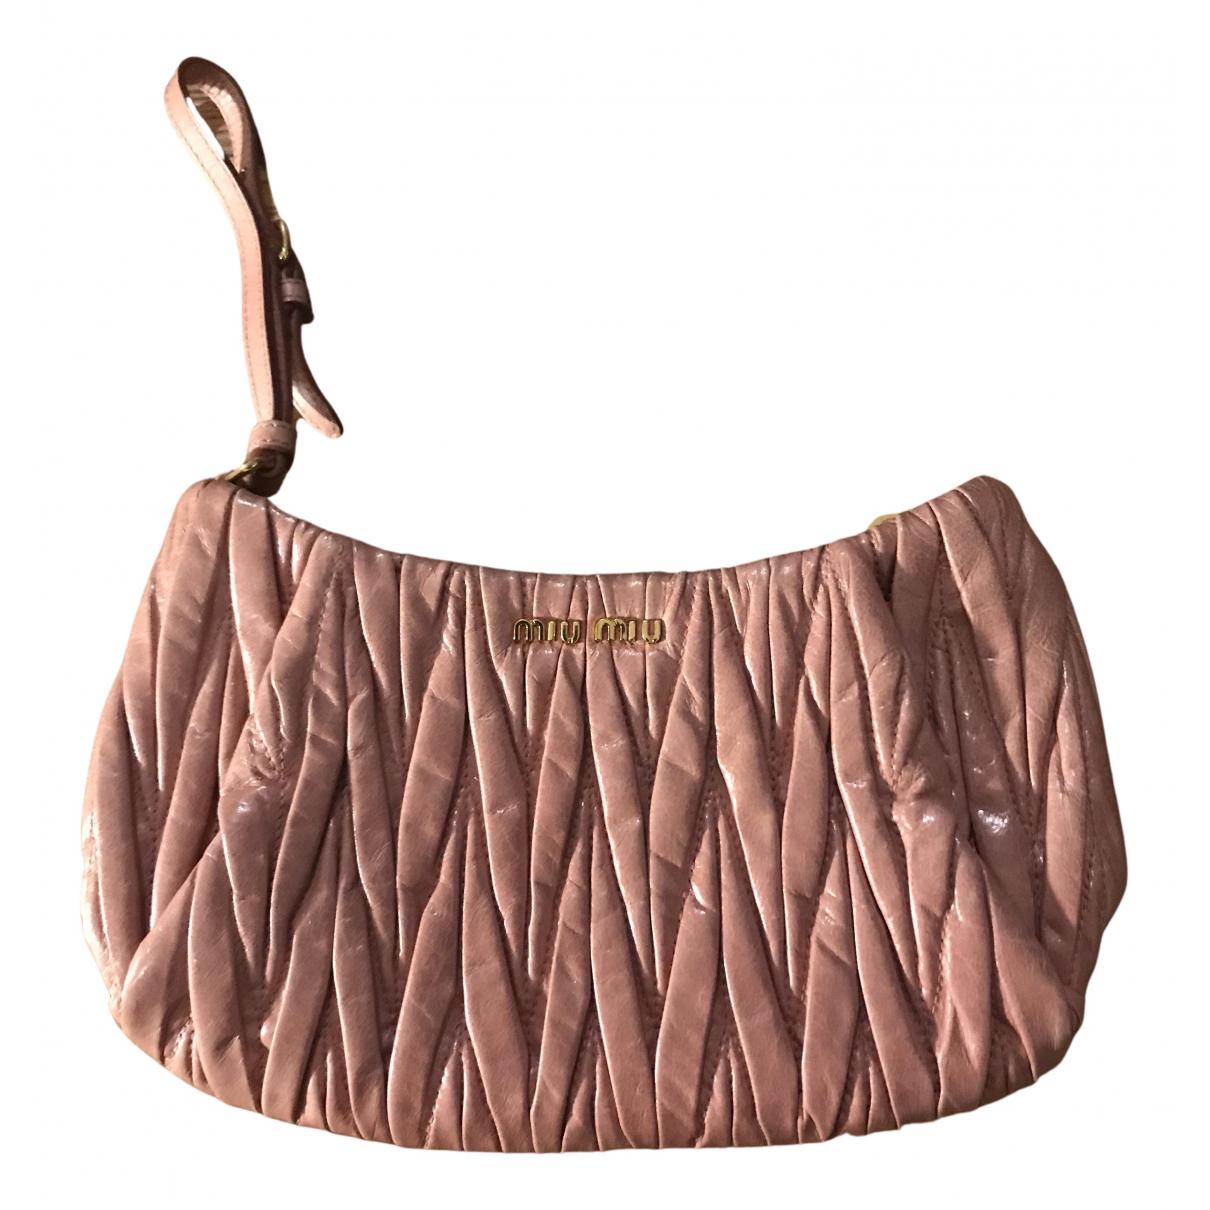 Miu Miu N Pink Leather Clutch bag for Women N